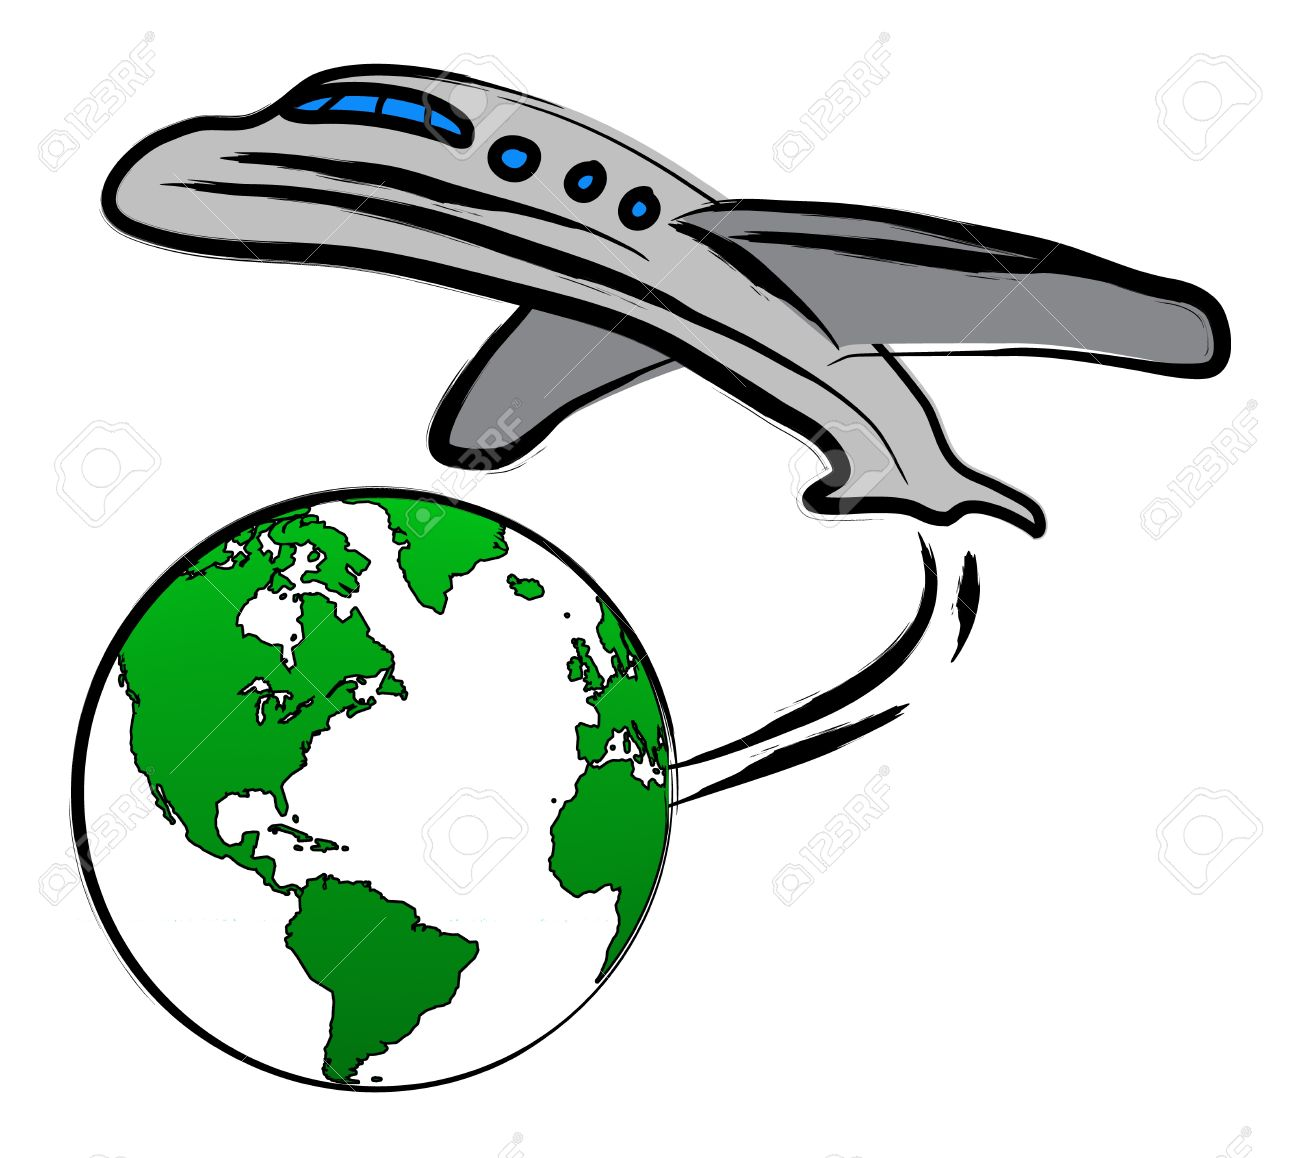 Traveling plane destination clipart svg black and white Traveling plane destination clipart - ClipartFest svg black and white